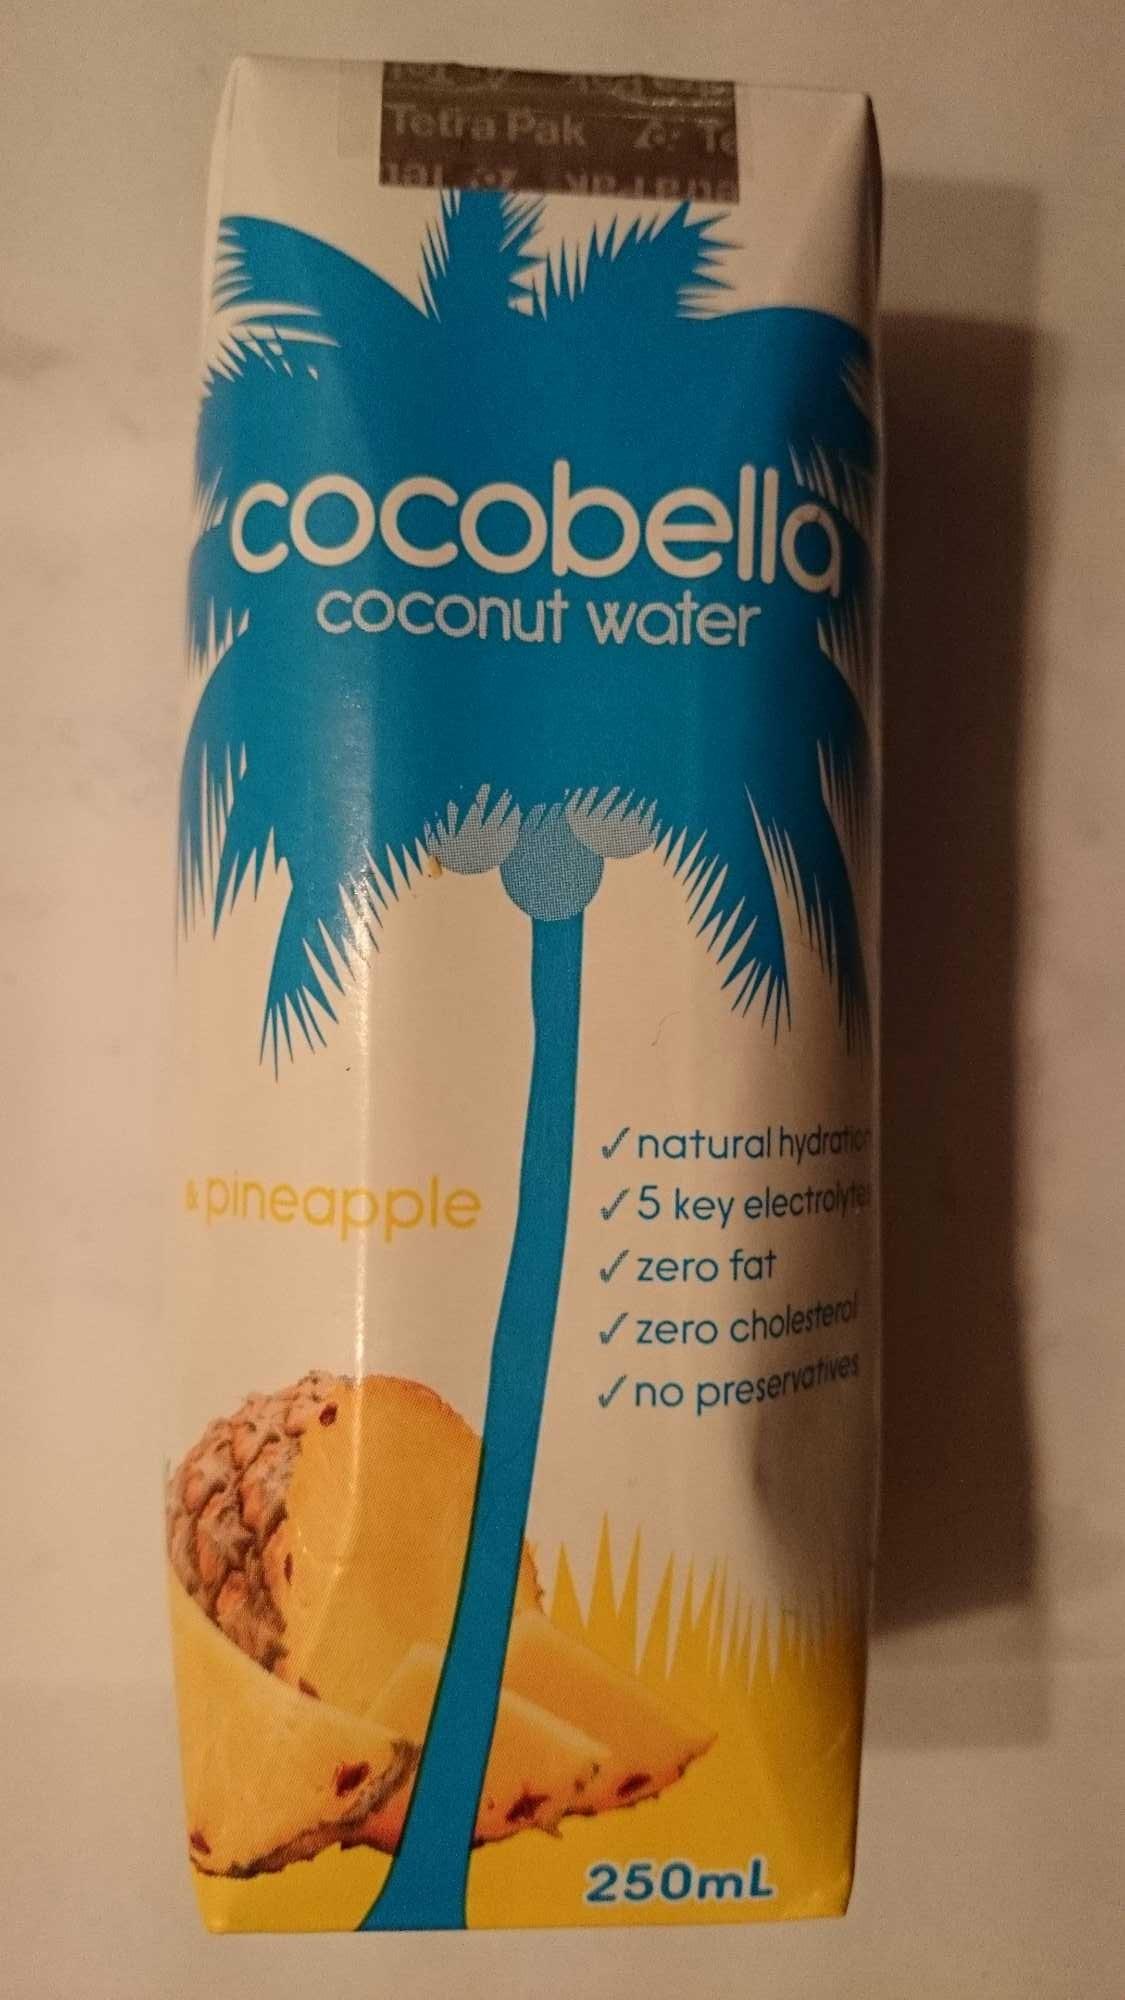 Cocobella Coconut Water Pineapple - Product - en